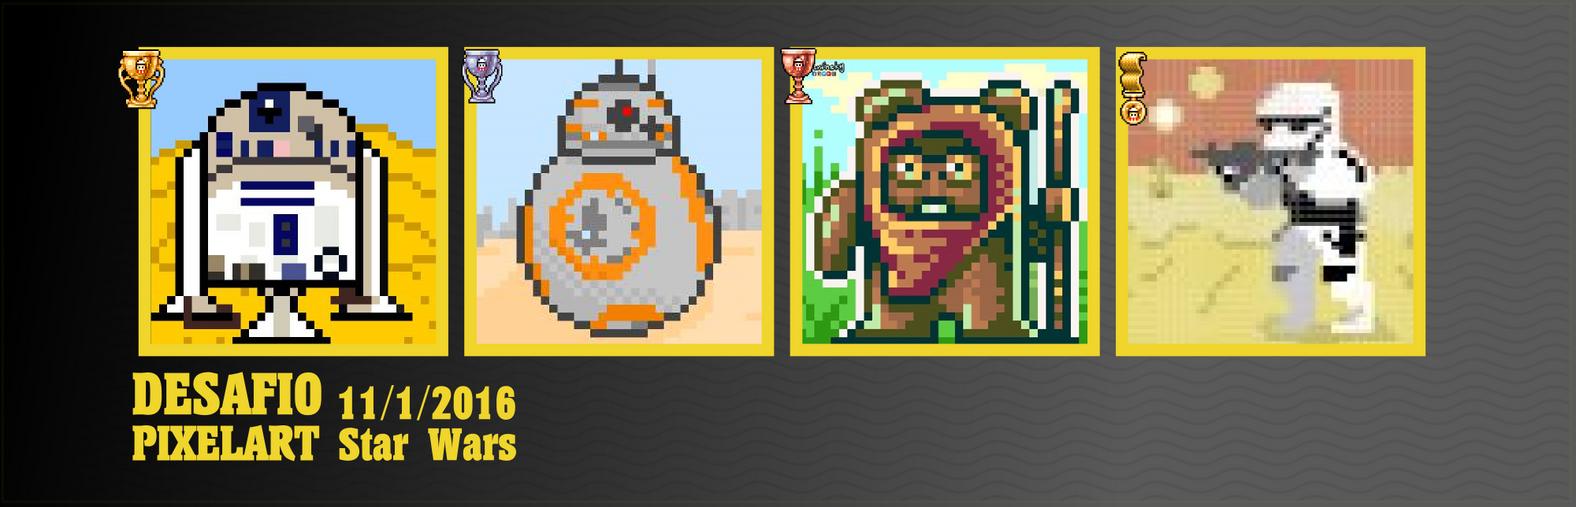 Desafio pixelart 11/1/2015 Star Wars by Christian223